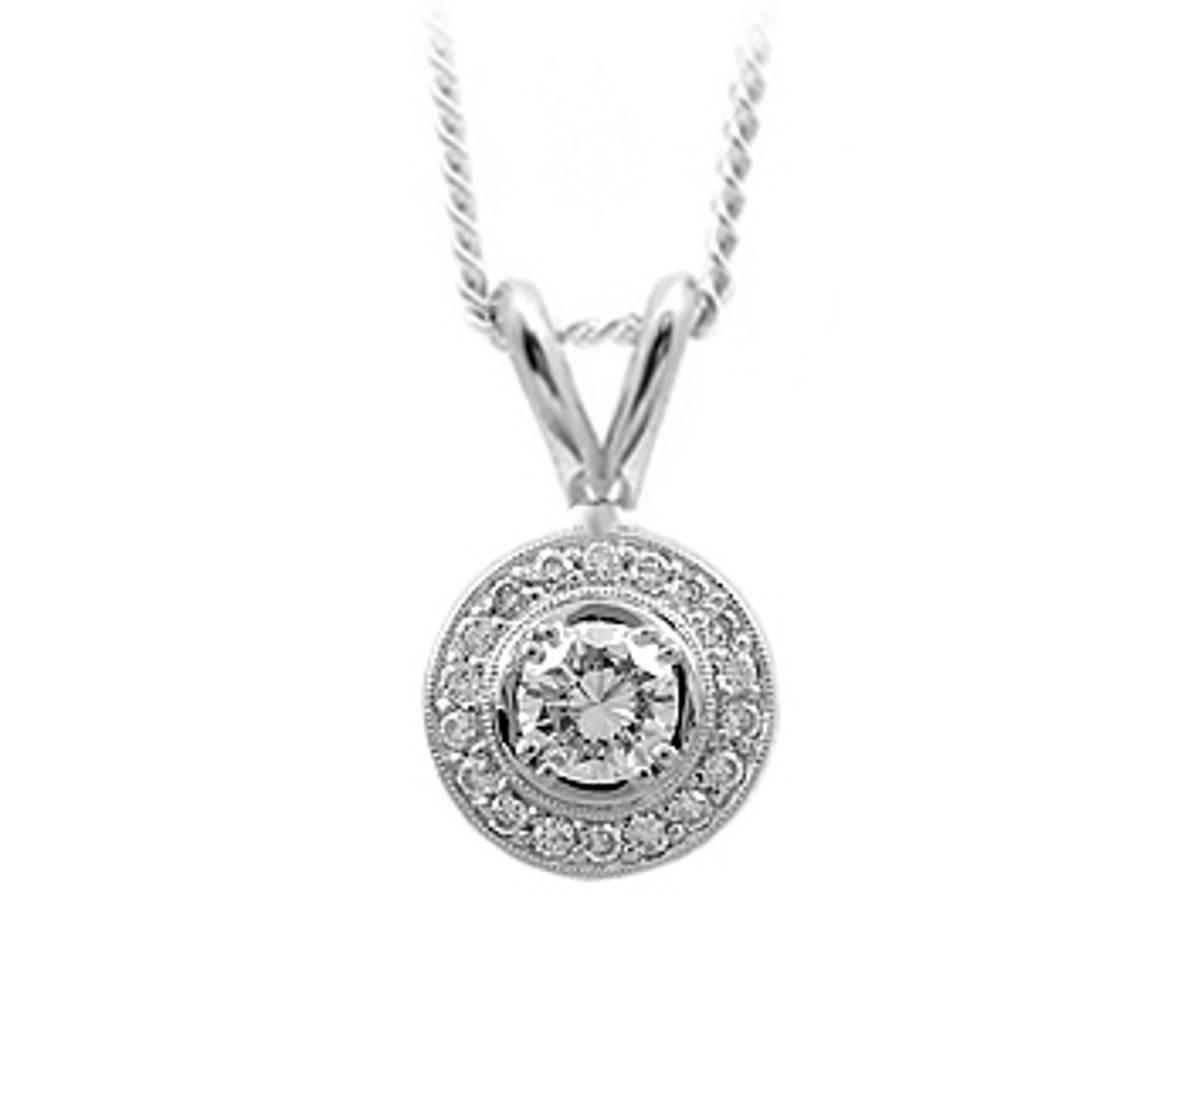 "18k White Gold Brilliant Cut Diamond Cluster Pendant On 18k White Gold 18"" Chain Total Diamond Weight 0.54cts  18k White Gold Pendant Length 1.9cmPendant width 1.1cm"